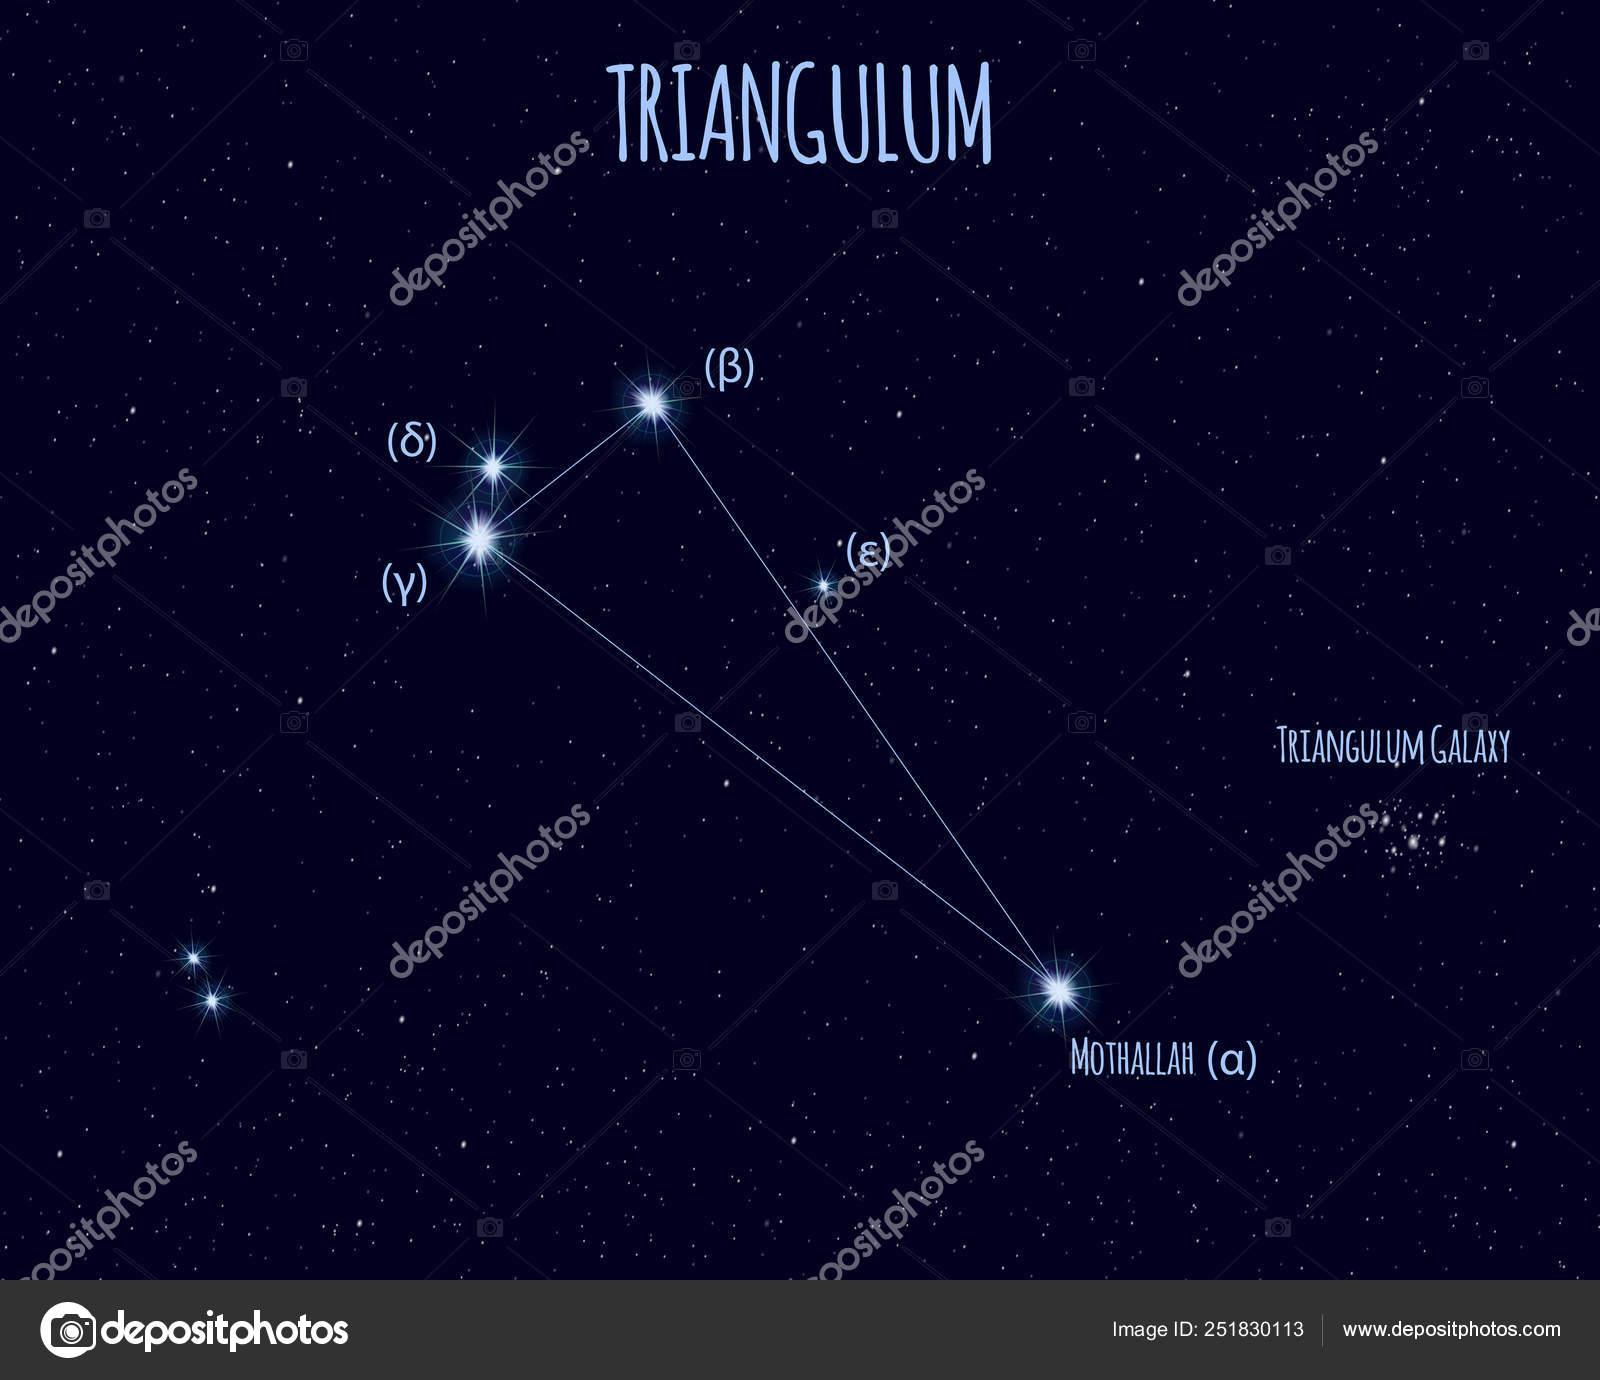 названия и картинки созвездия